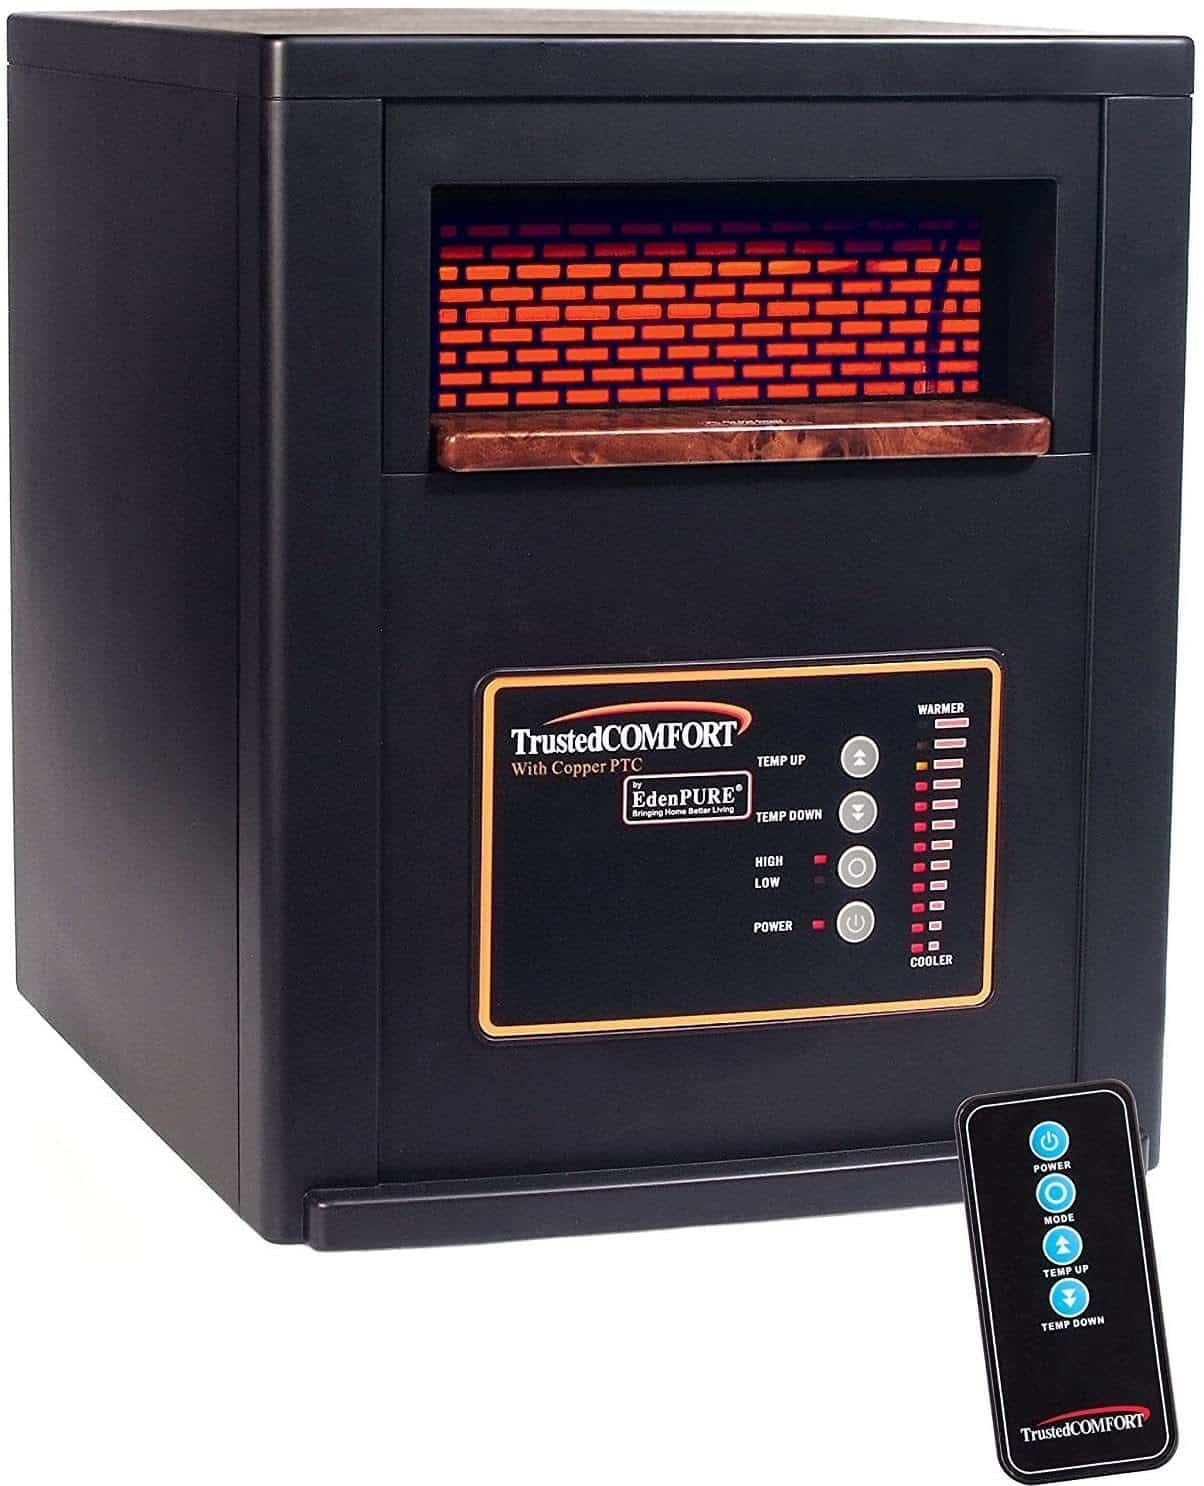 EdenPURE A5551b Trusted Comfort Heater